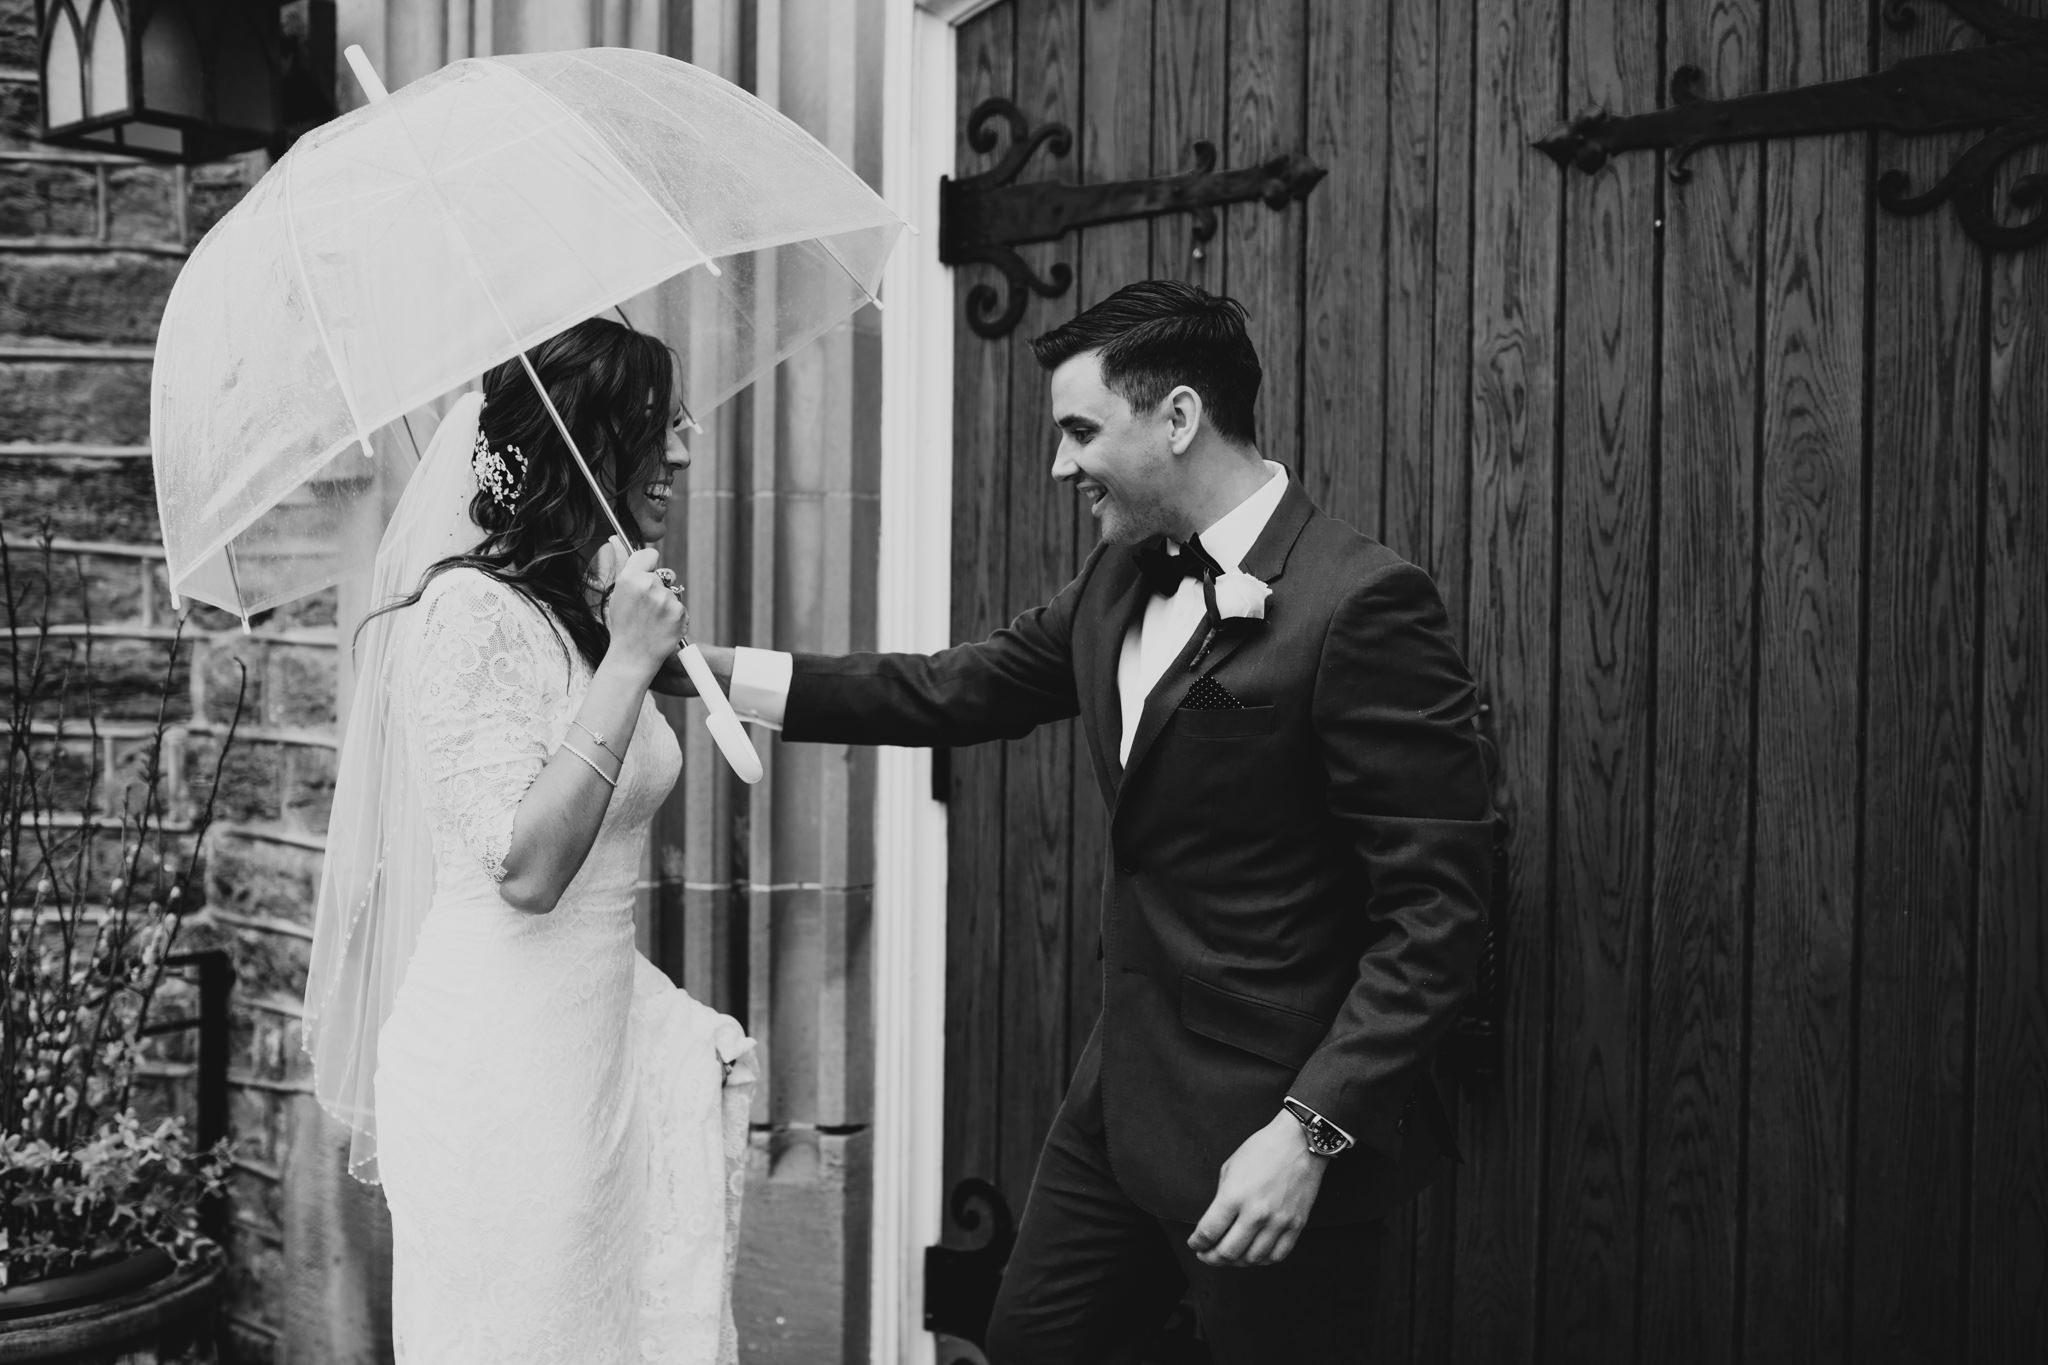 113-WEB-Jonathan-Kuhn-Photography-Stephanie-Cameron-Wedding-6994_mini.jpg